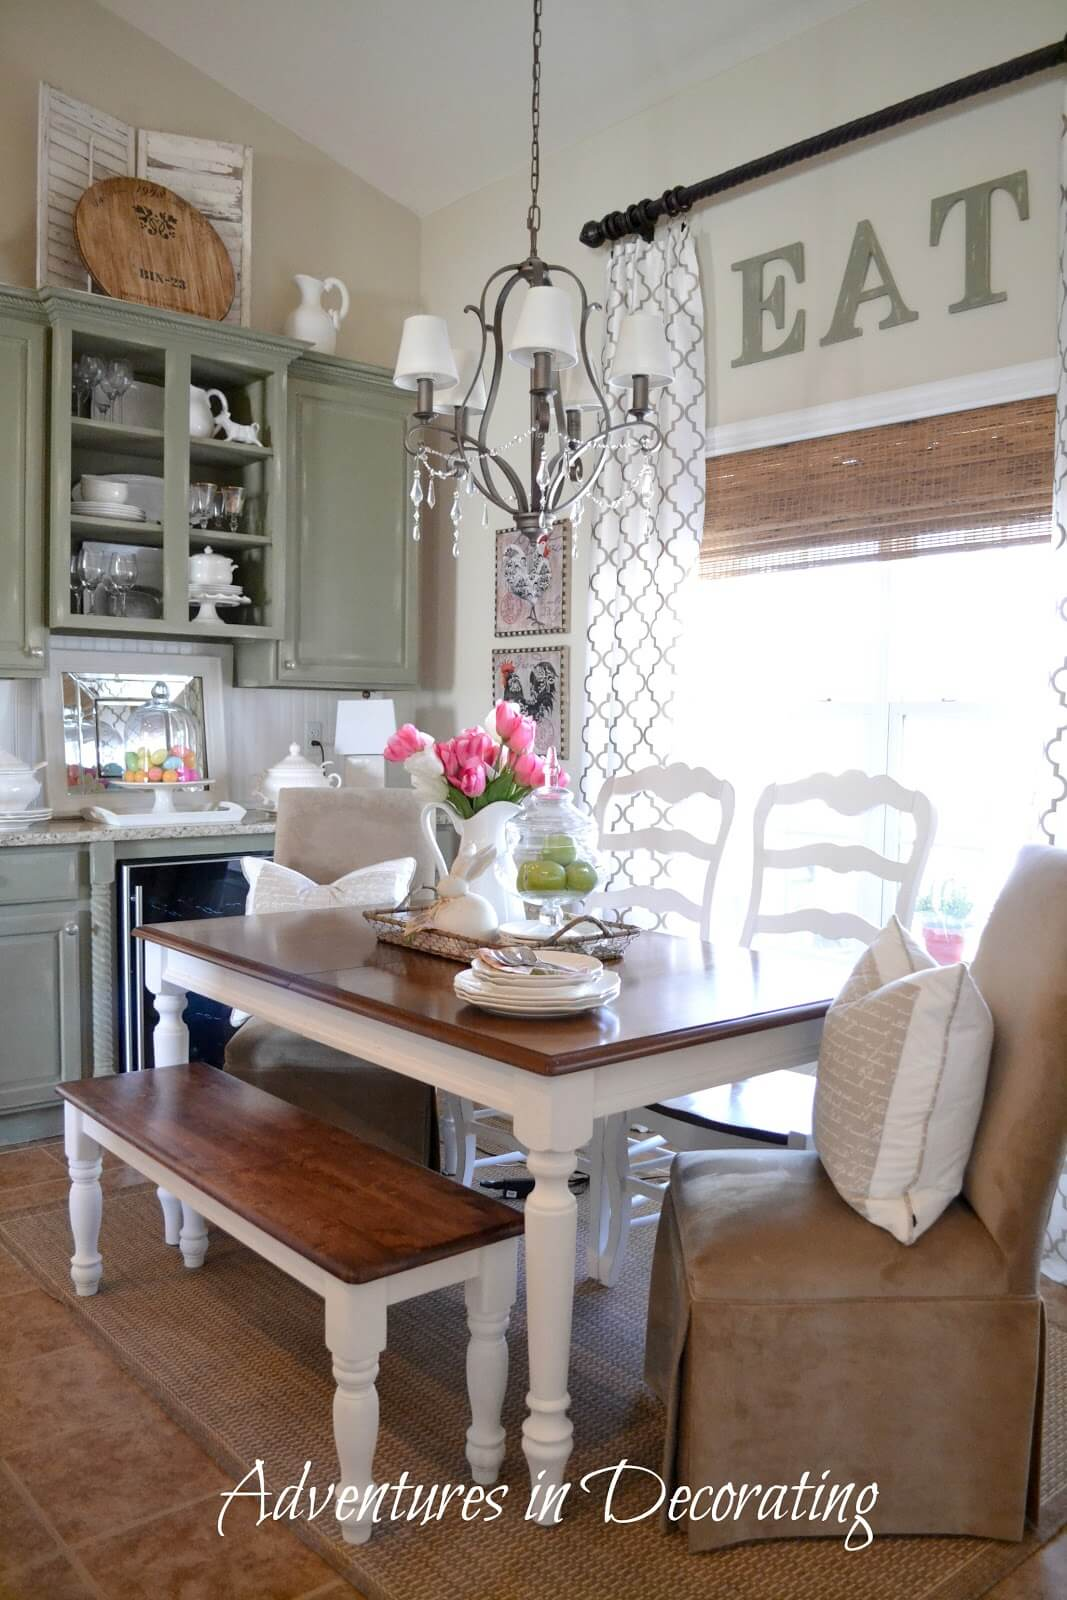 37 Best Farmhouse Dining Room Design and Decor Ideas for 2017 on Farmhouse Dining Room Curtain Ideas  id=62822